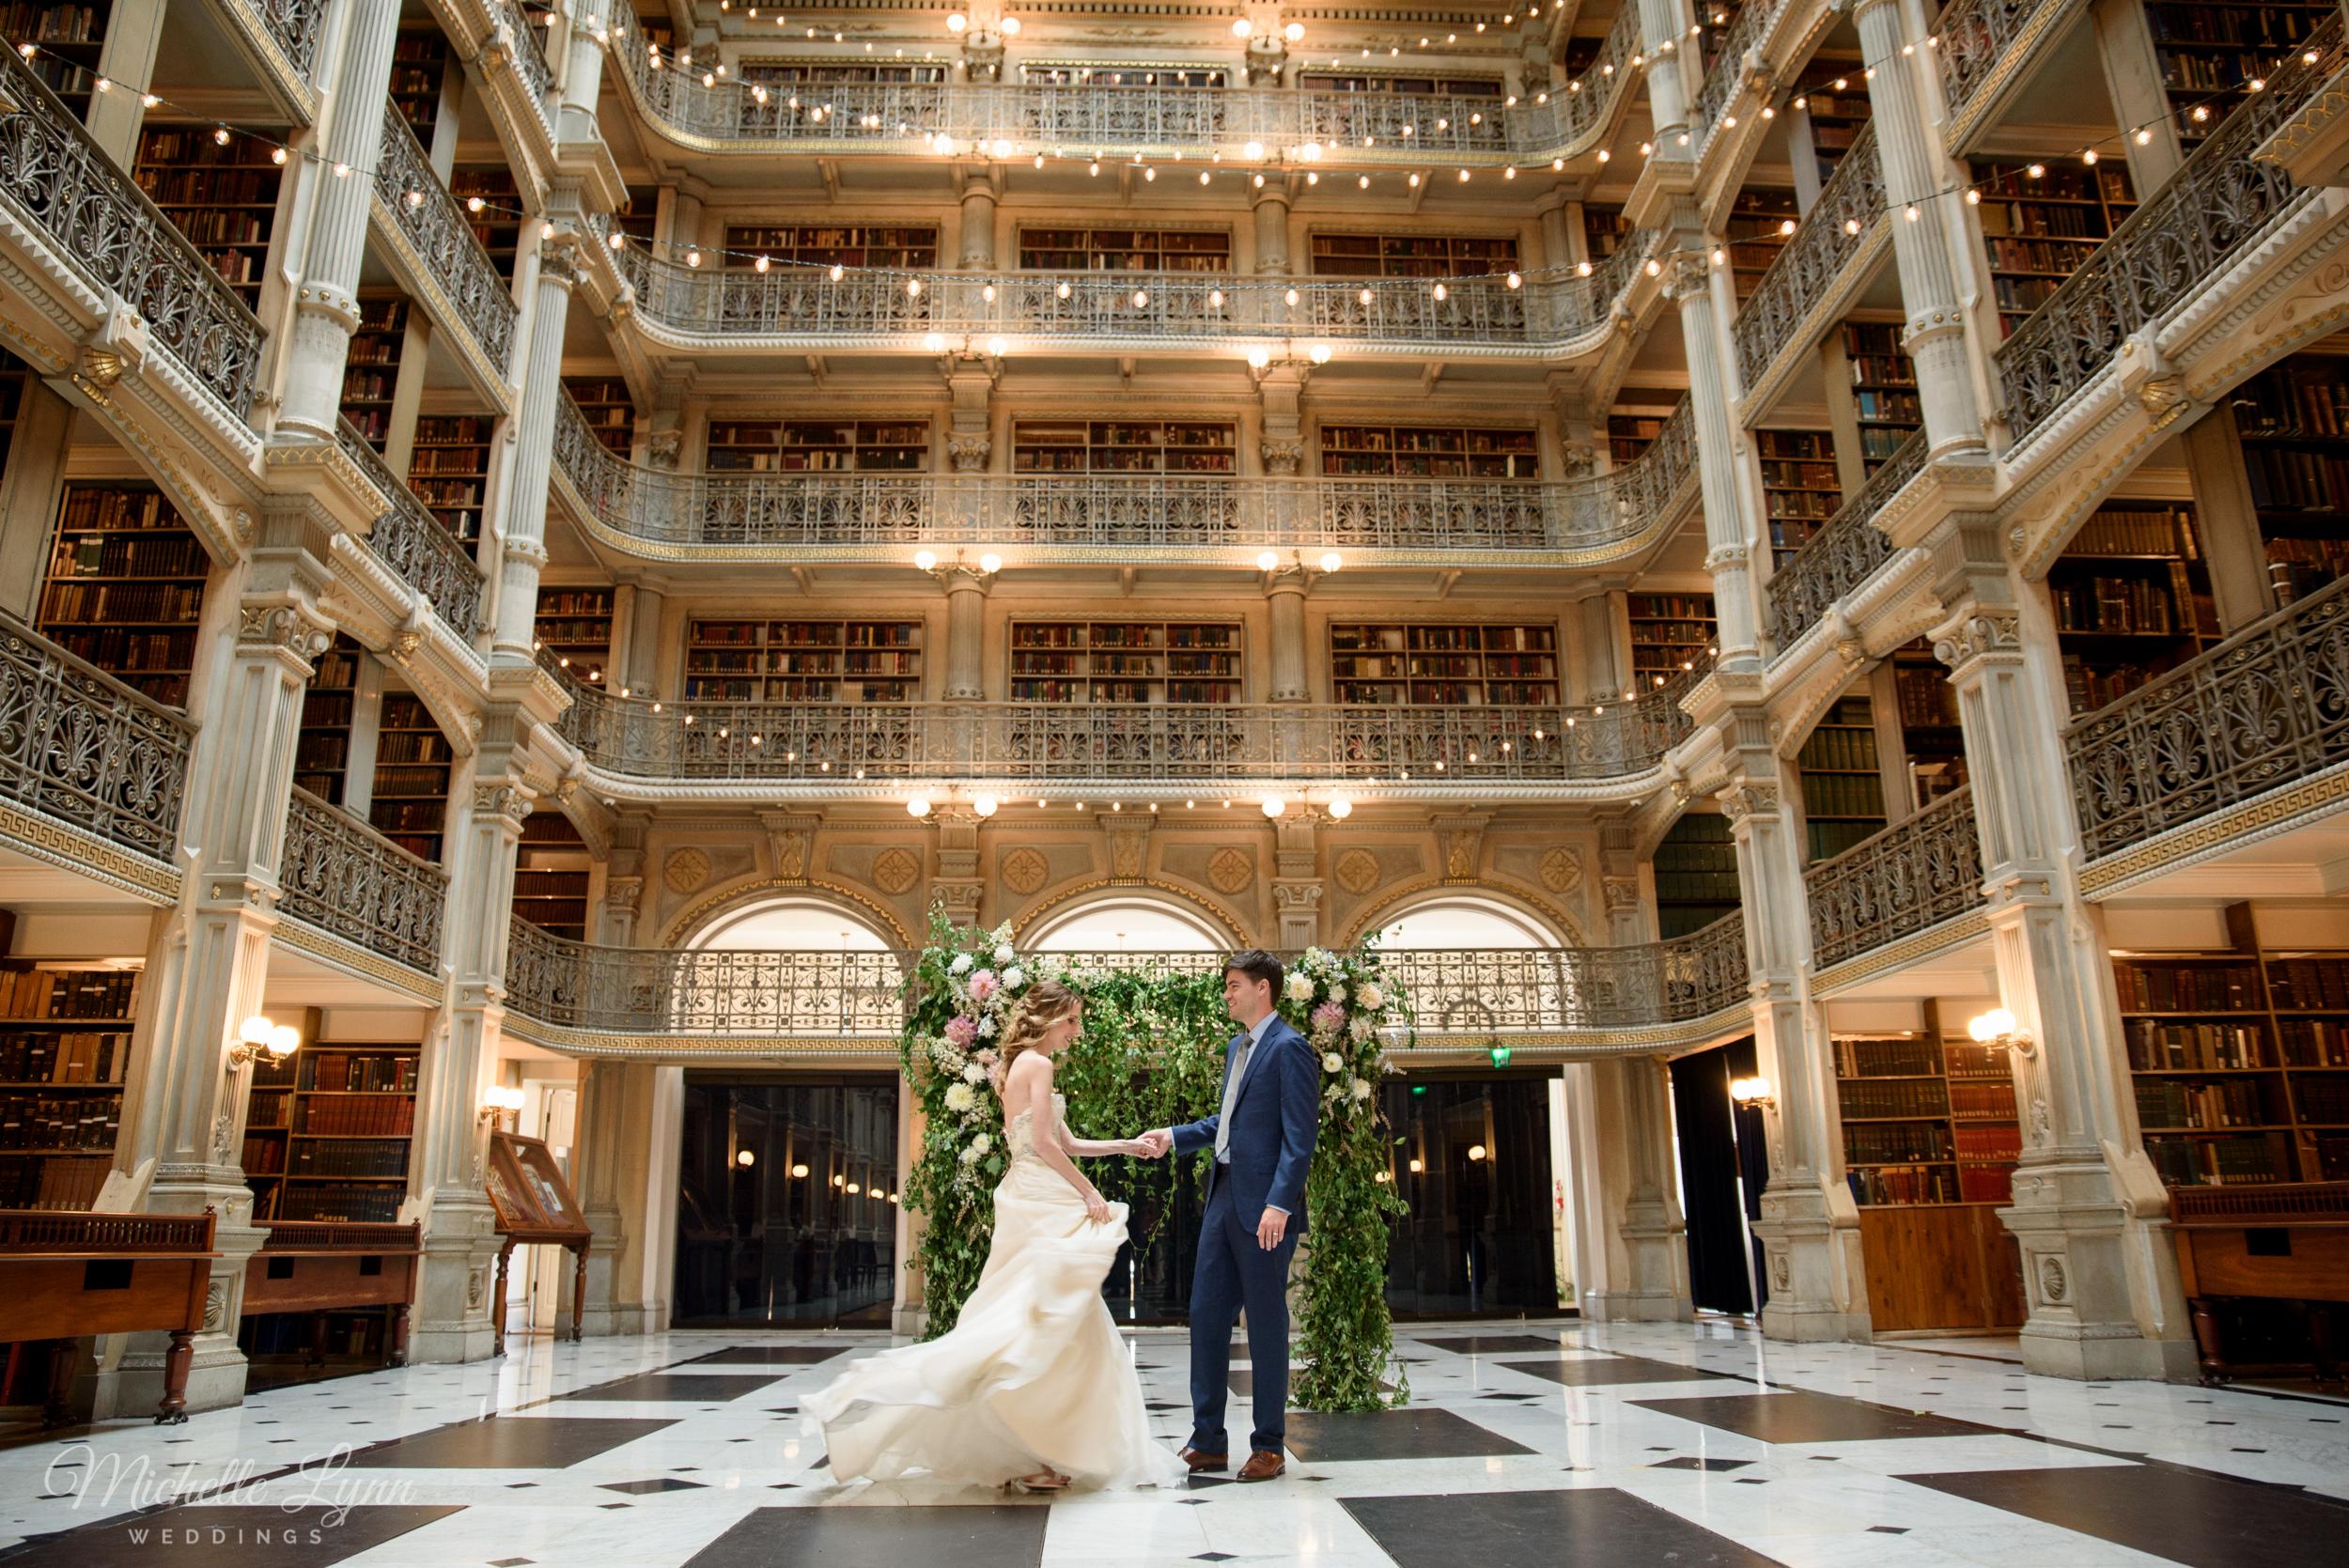 George_Peabody_Library-Wedding_Styled_Shoot-39.jpg